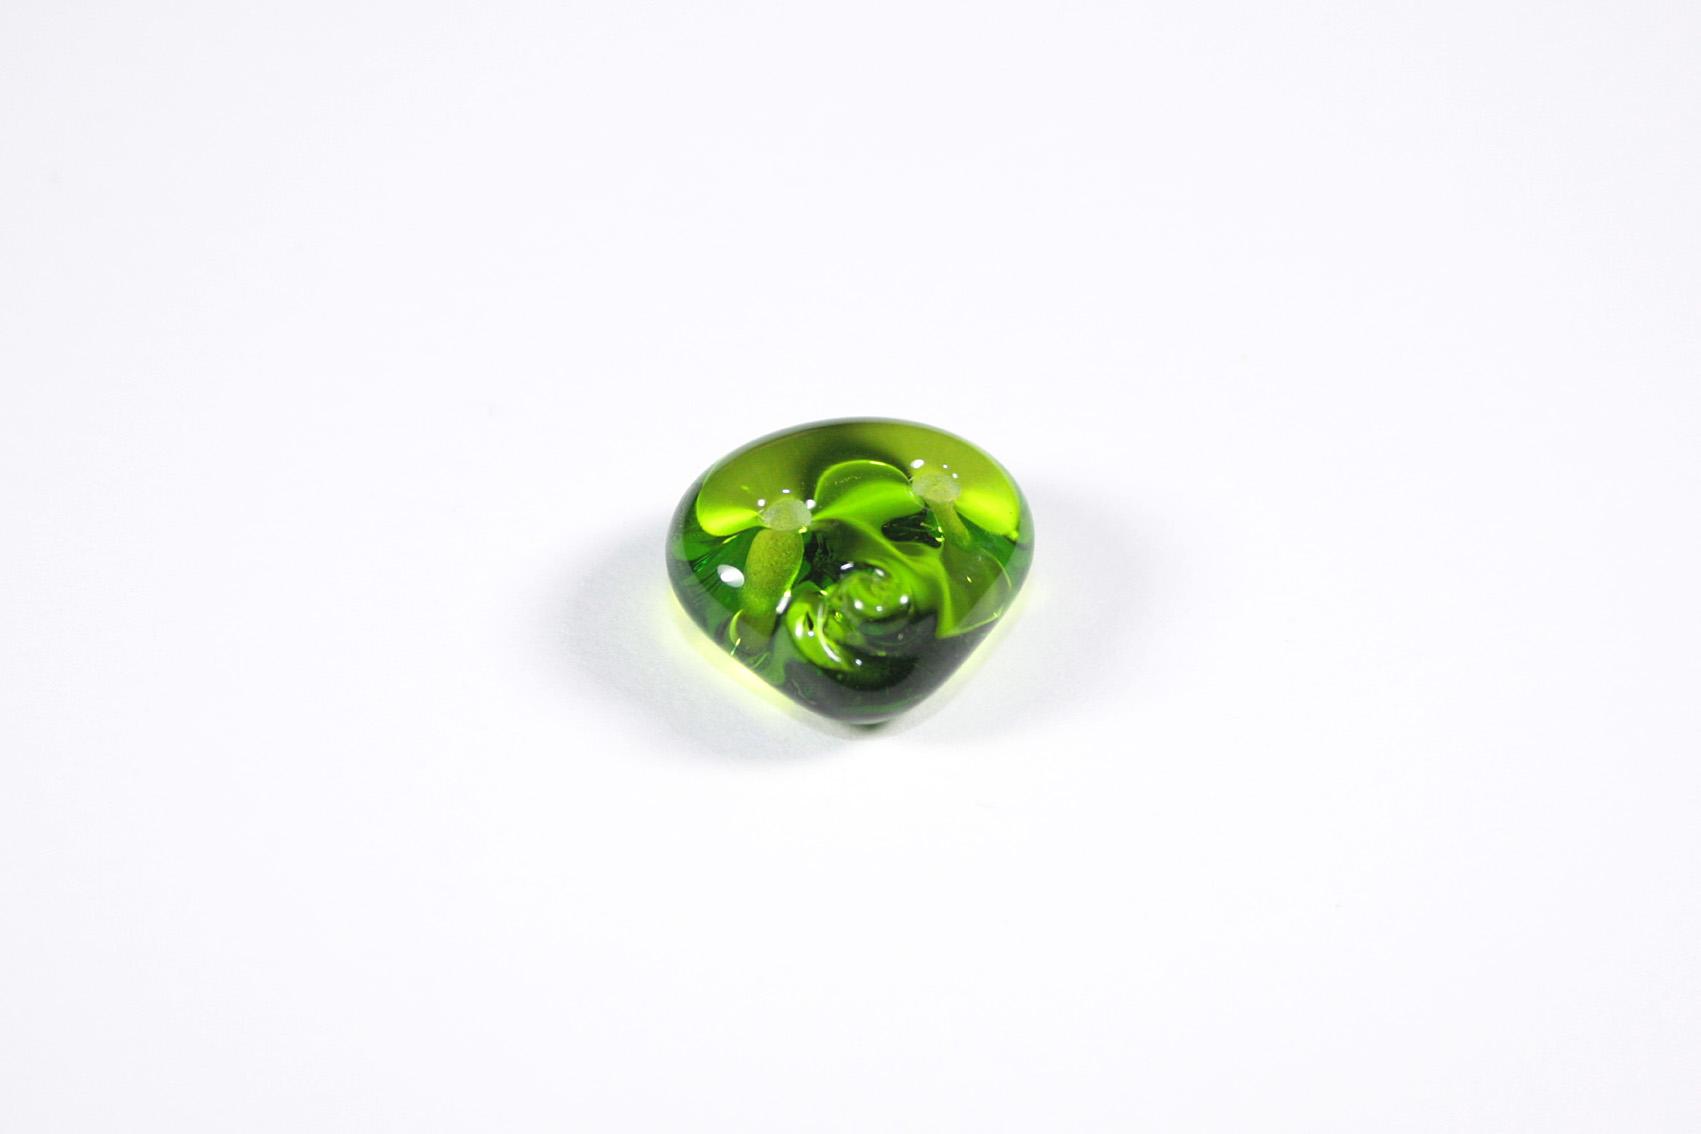 greenbead1.17.1.14